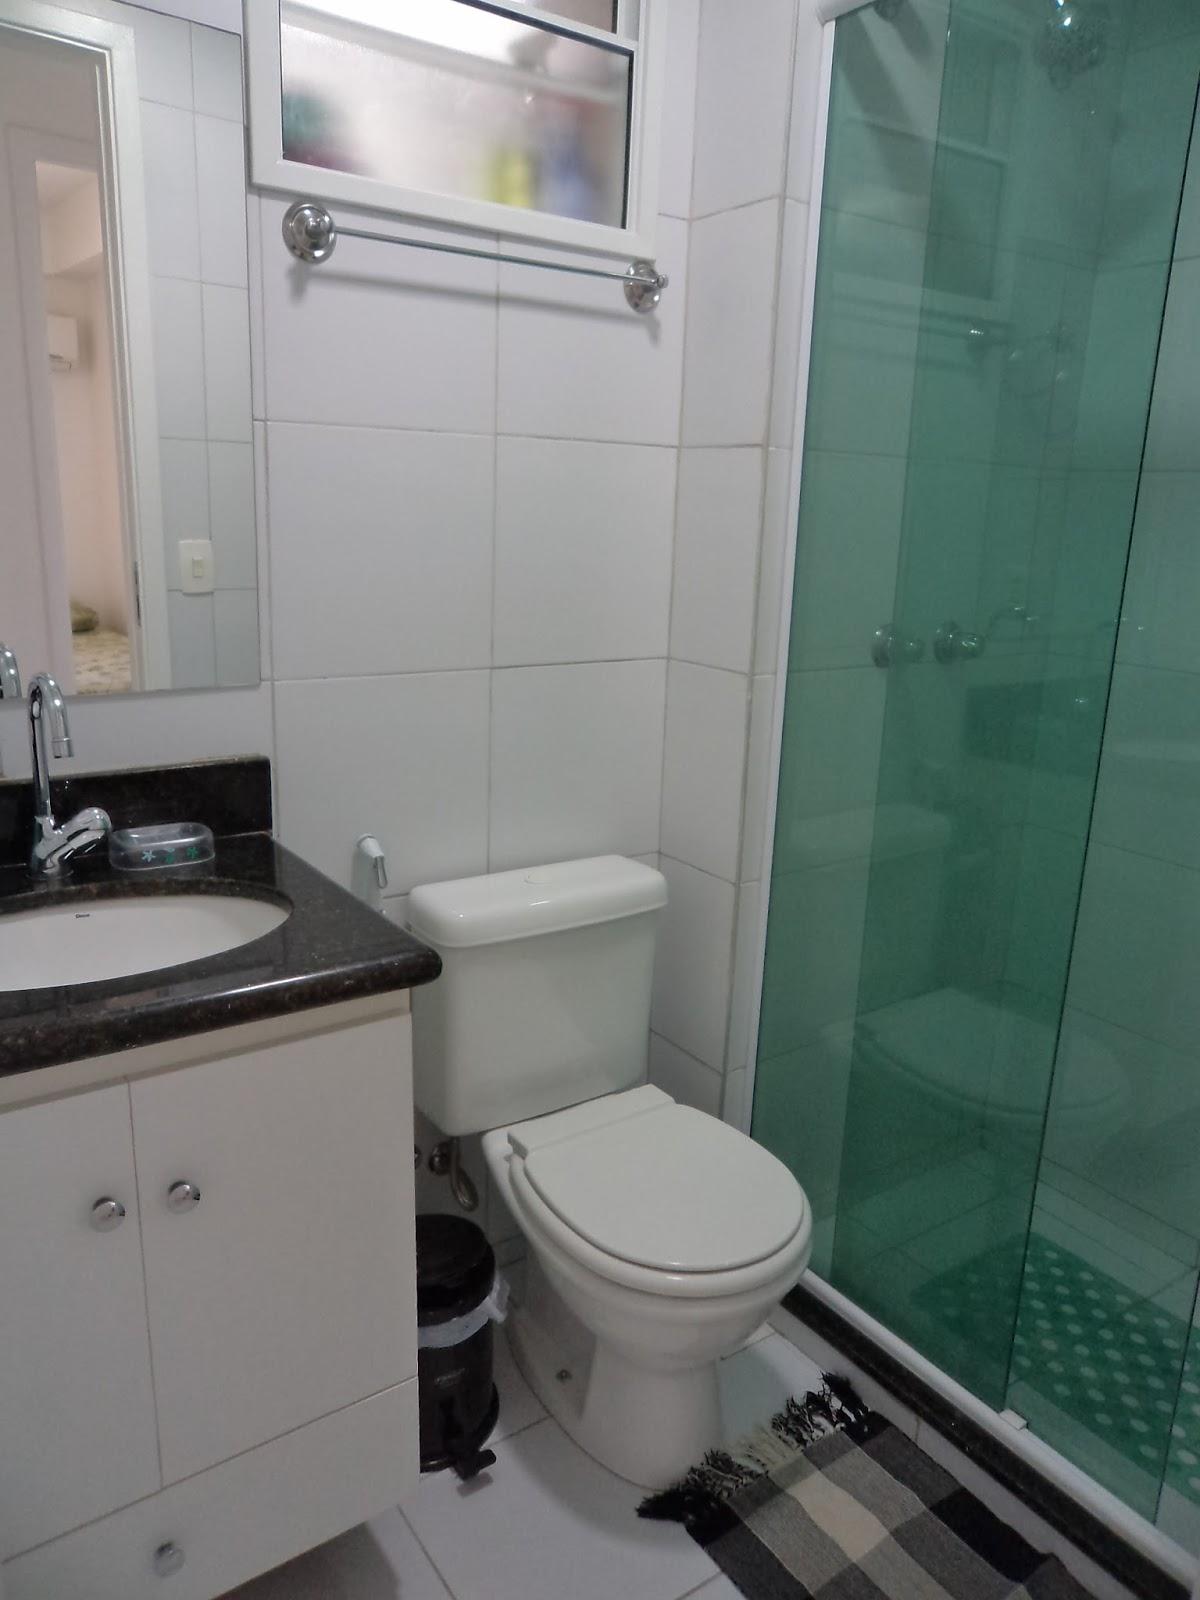 Aluguel por temporada em Fortaleza: APARTAMENTO NA PRAIA DO FUTURO  #375B4E 1200x1600 Banheiro Container Fortaleza